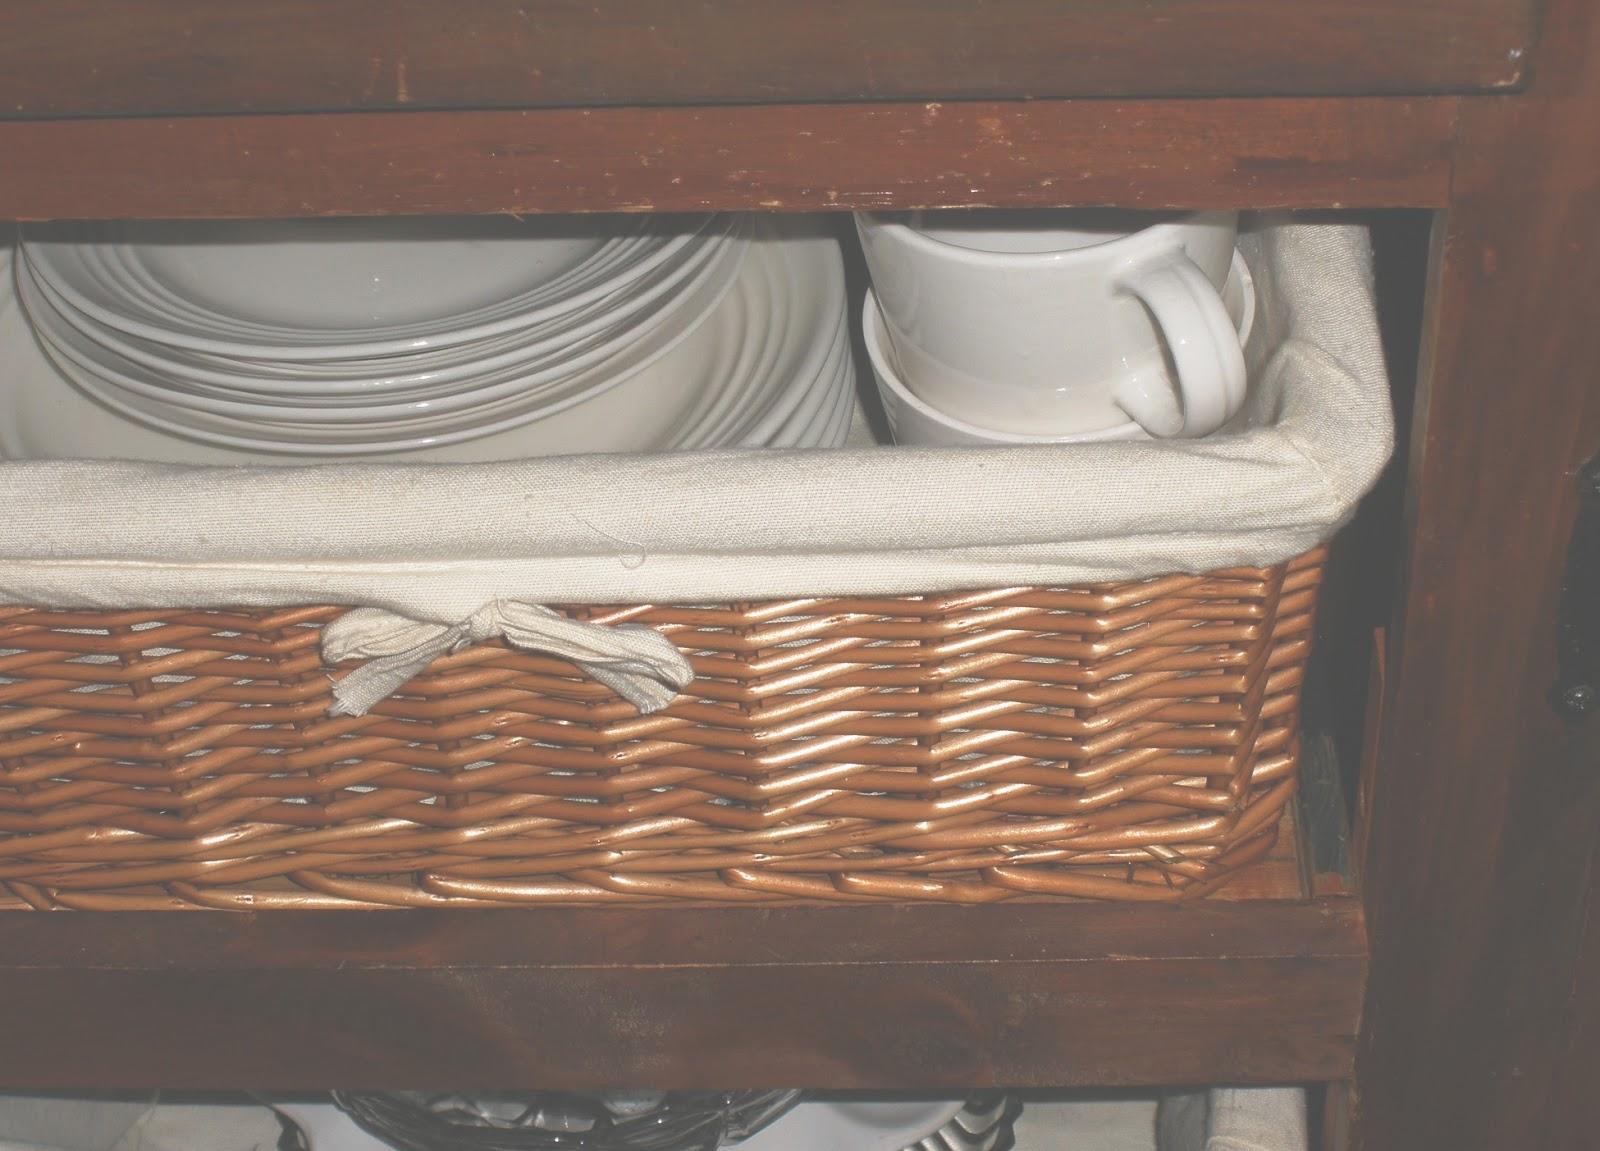 Superb img of Drawer Basket System Storage Organization Walmart Kitchen Basket  with #8A5B41 color and 1600x1151 pixels